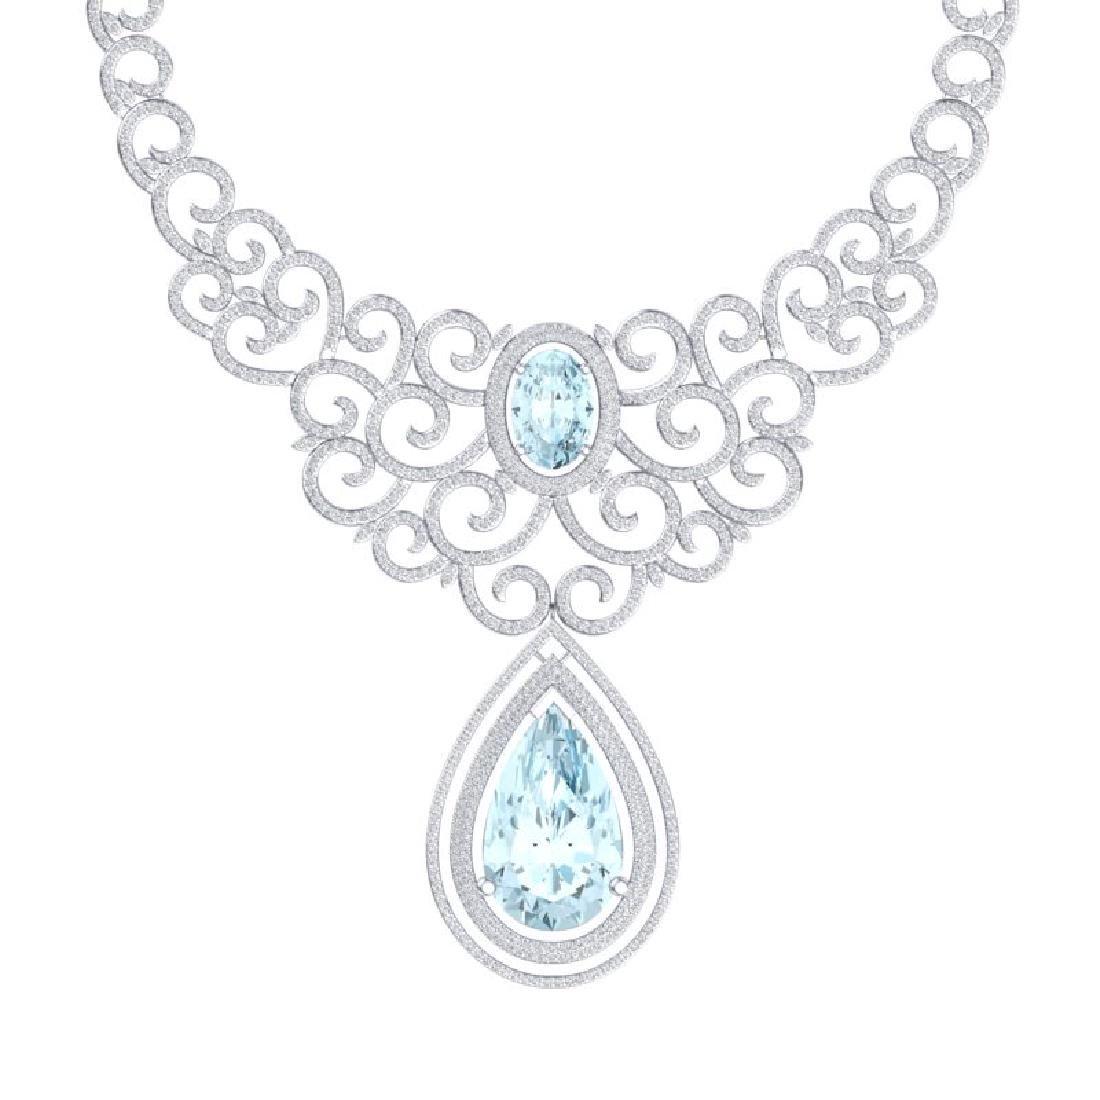 89.32 CTW Royalty Sky Topaz & VS Diamond Necklace 18K